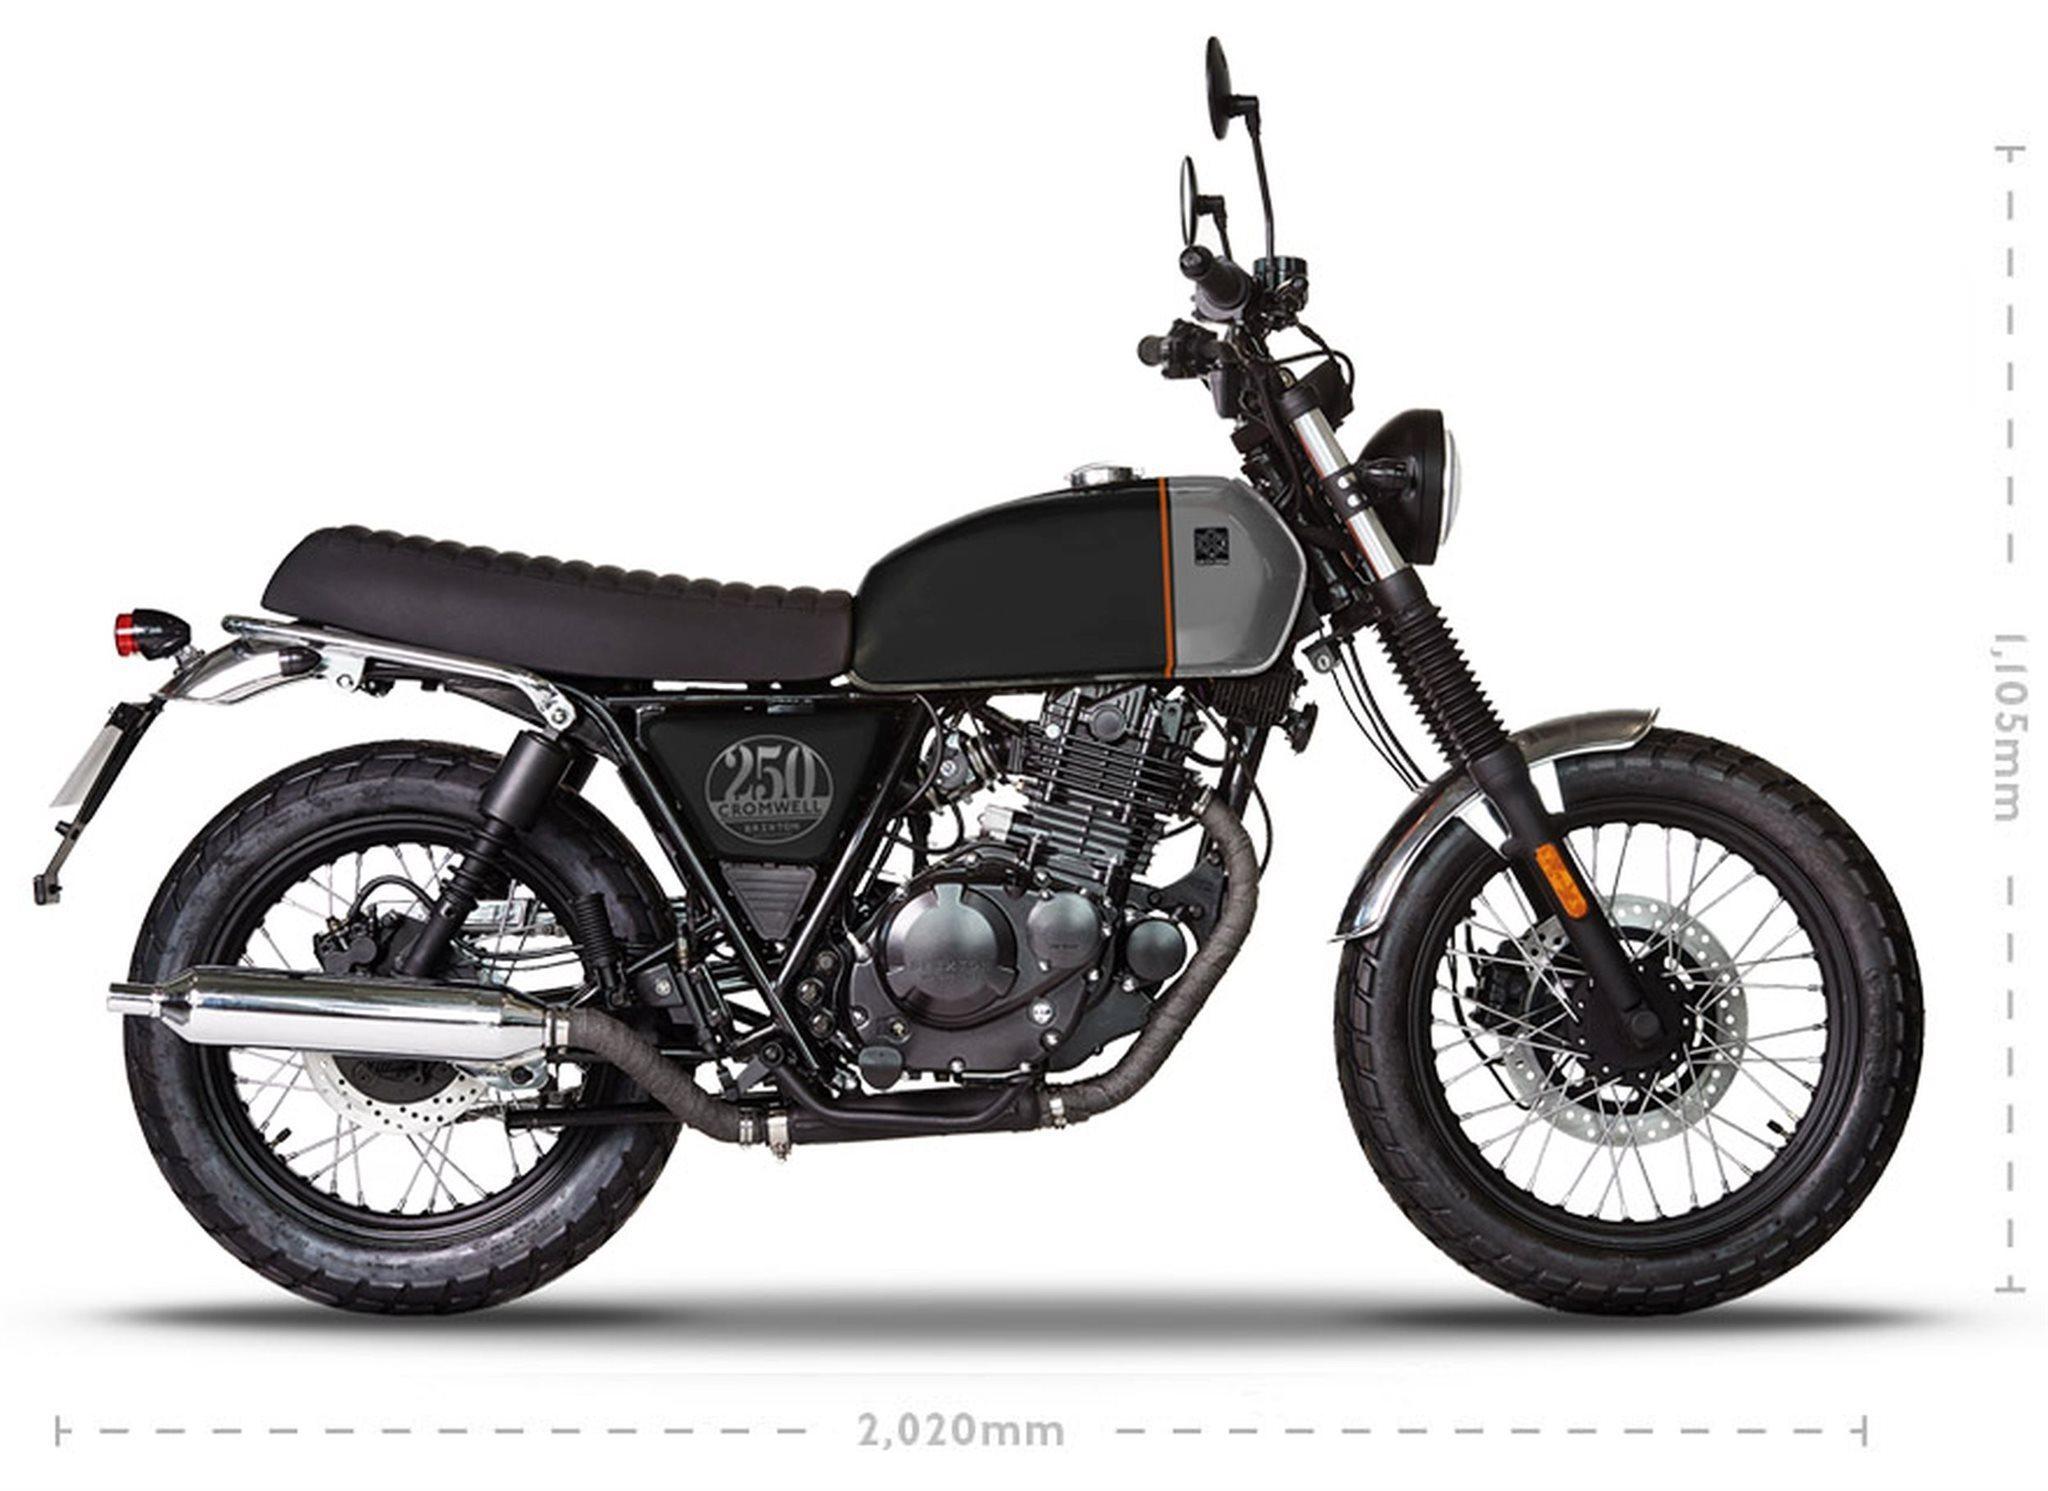 Brixton Cromwell 250 Motorrad, neu